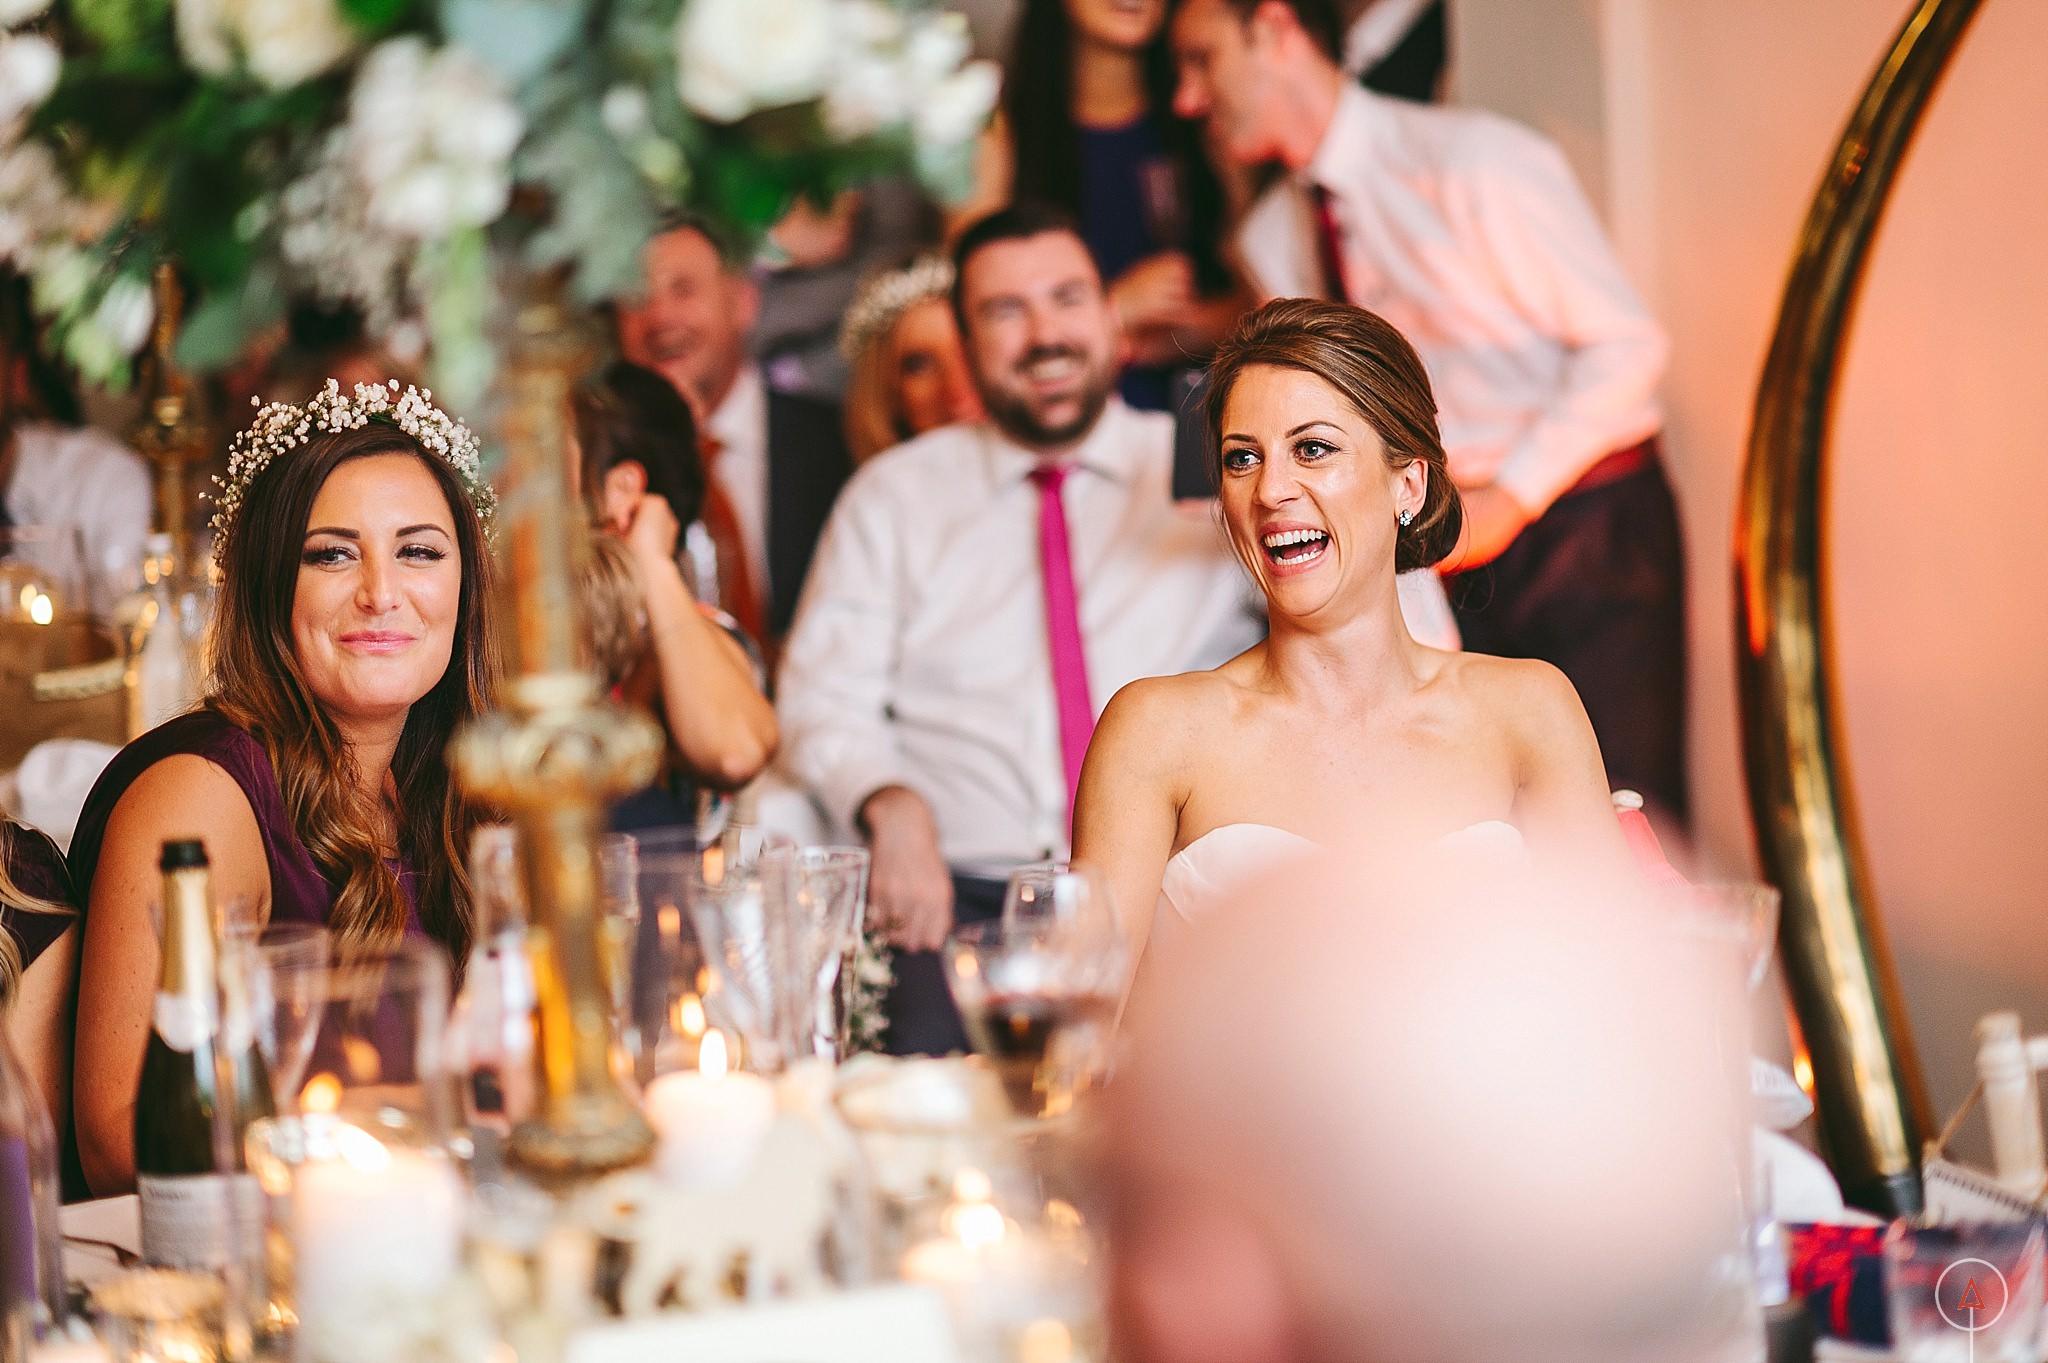 cardiff-wedding-photographer-aga-tomaszek_0306